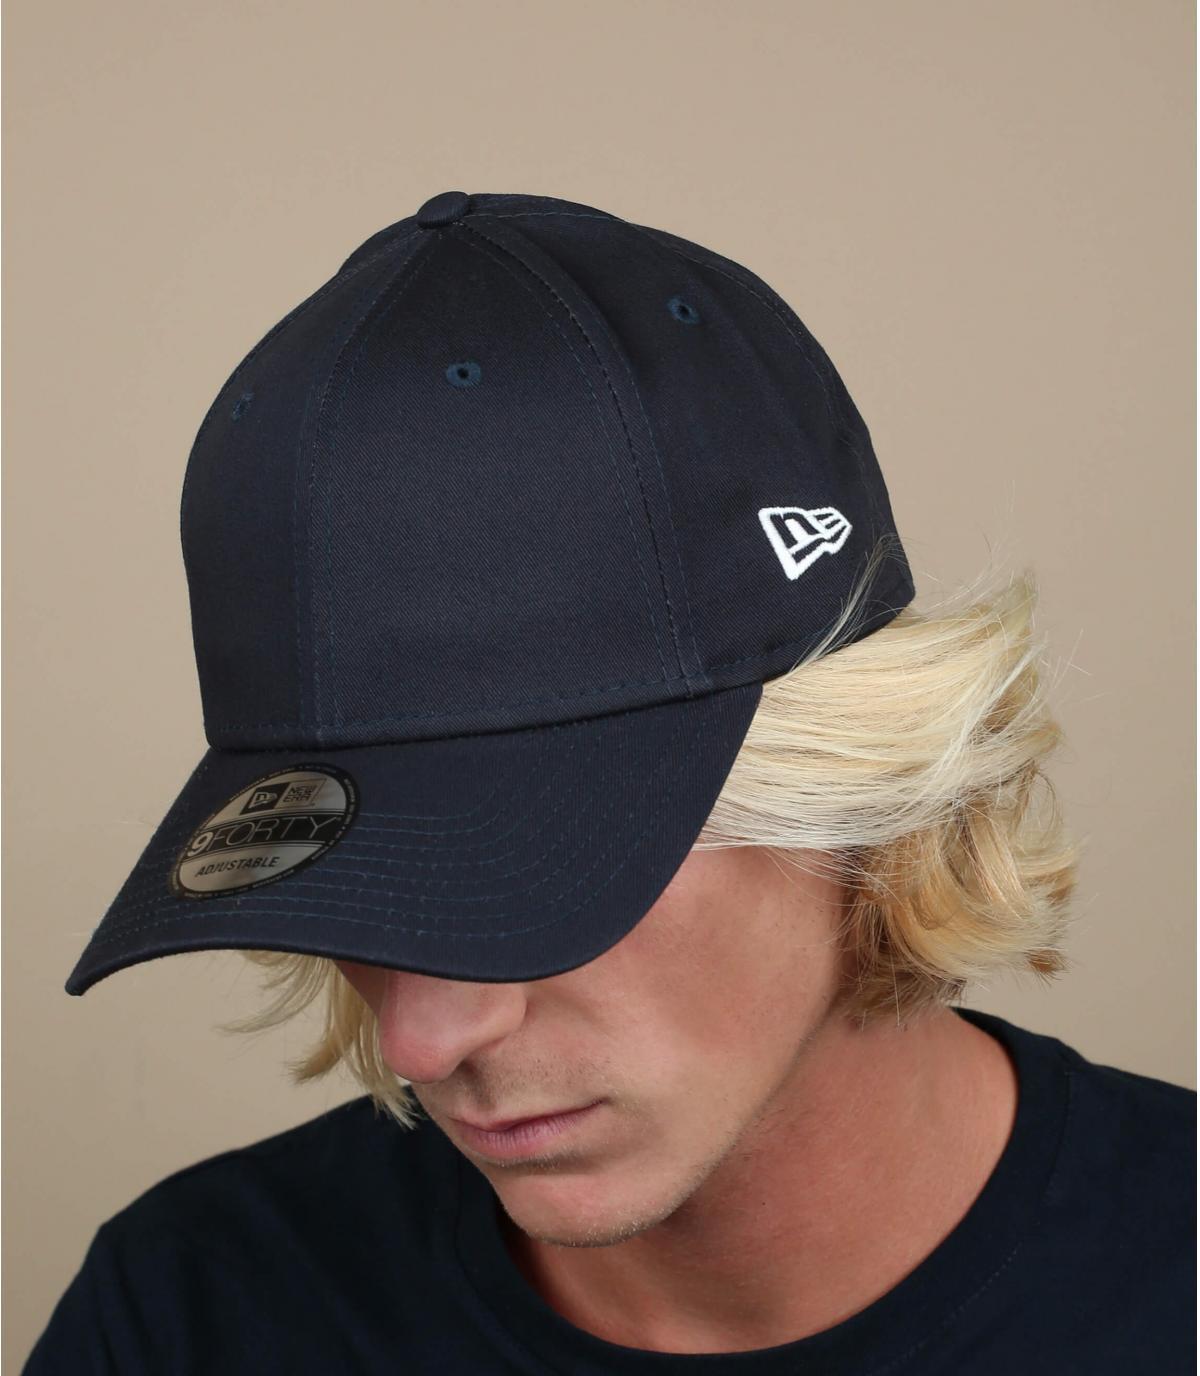 Navy curved visor cap